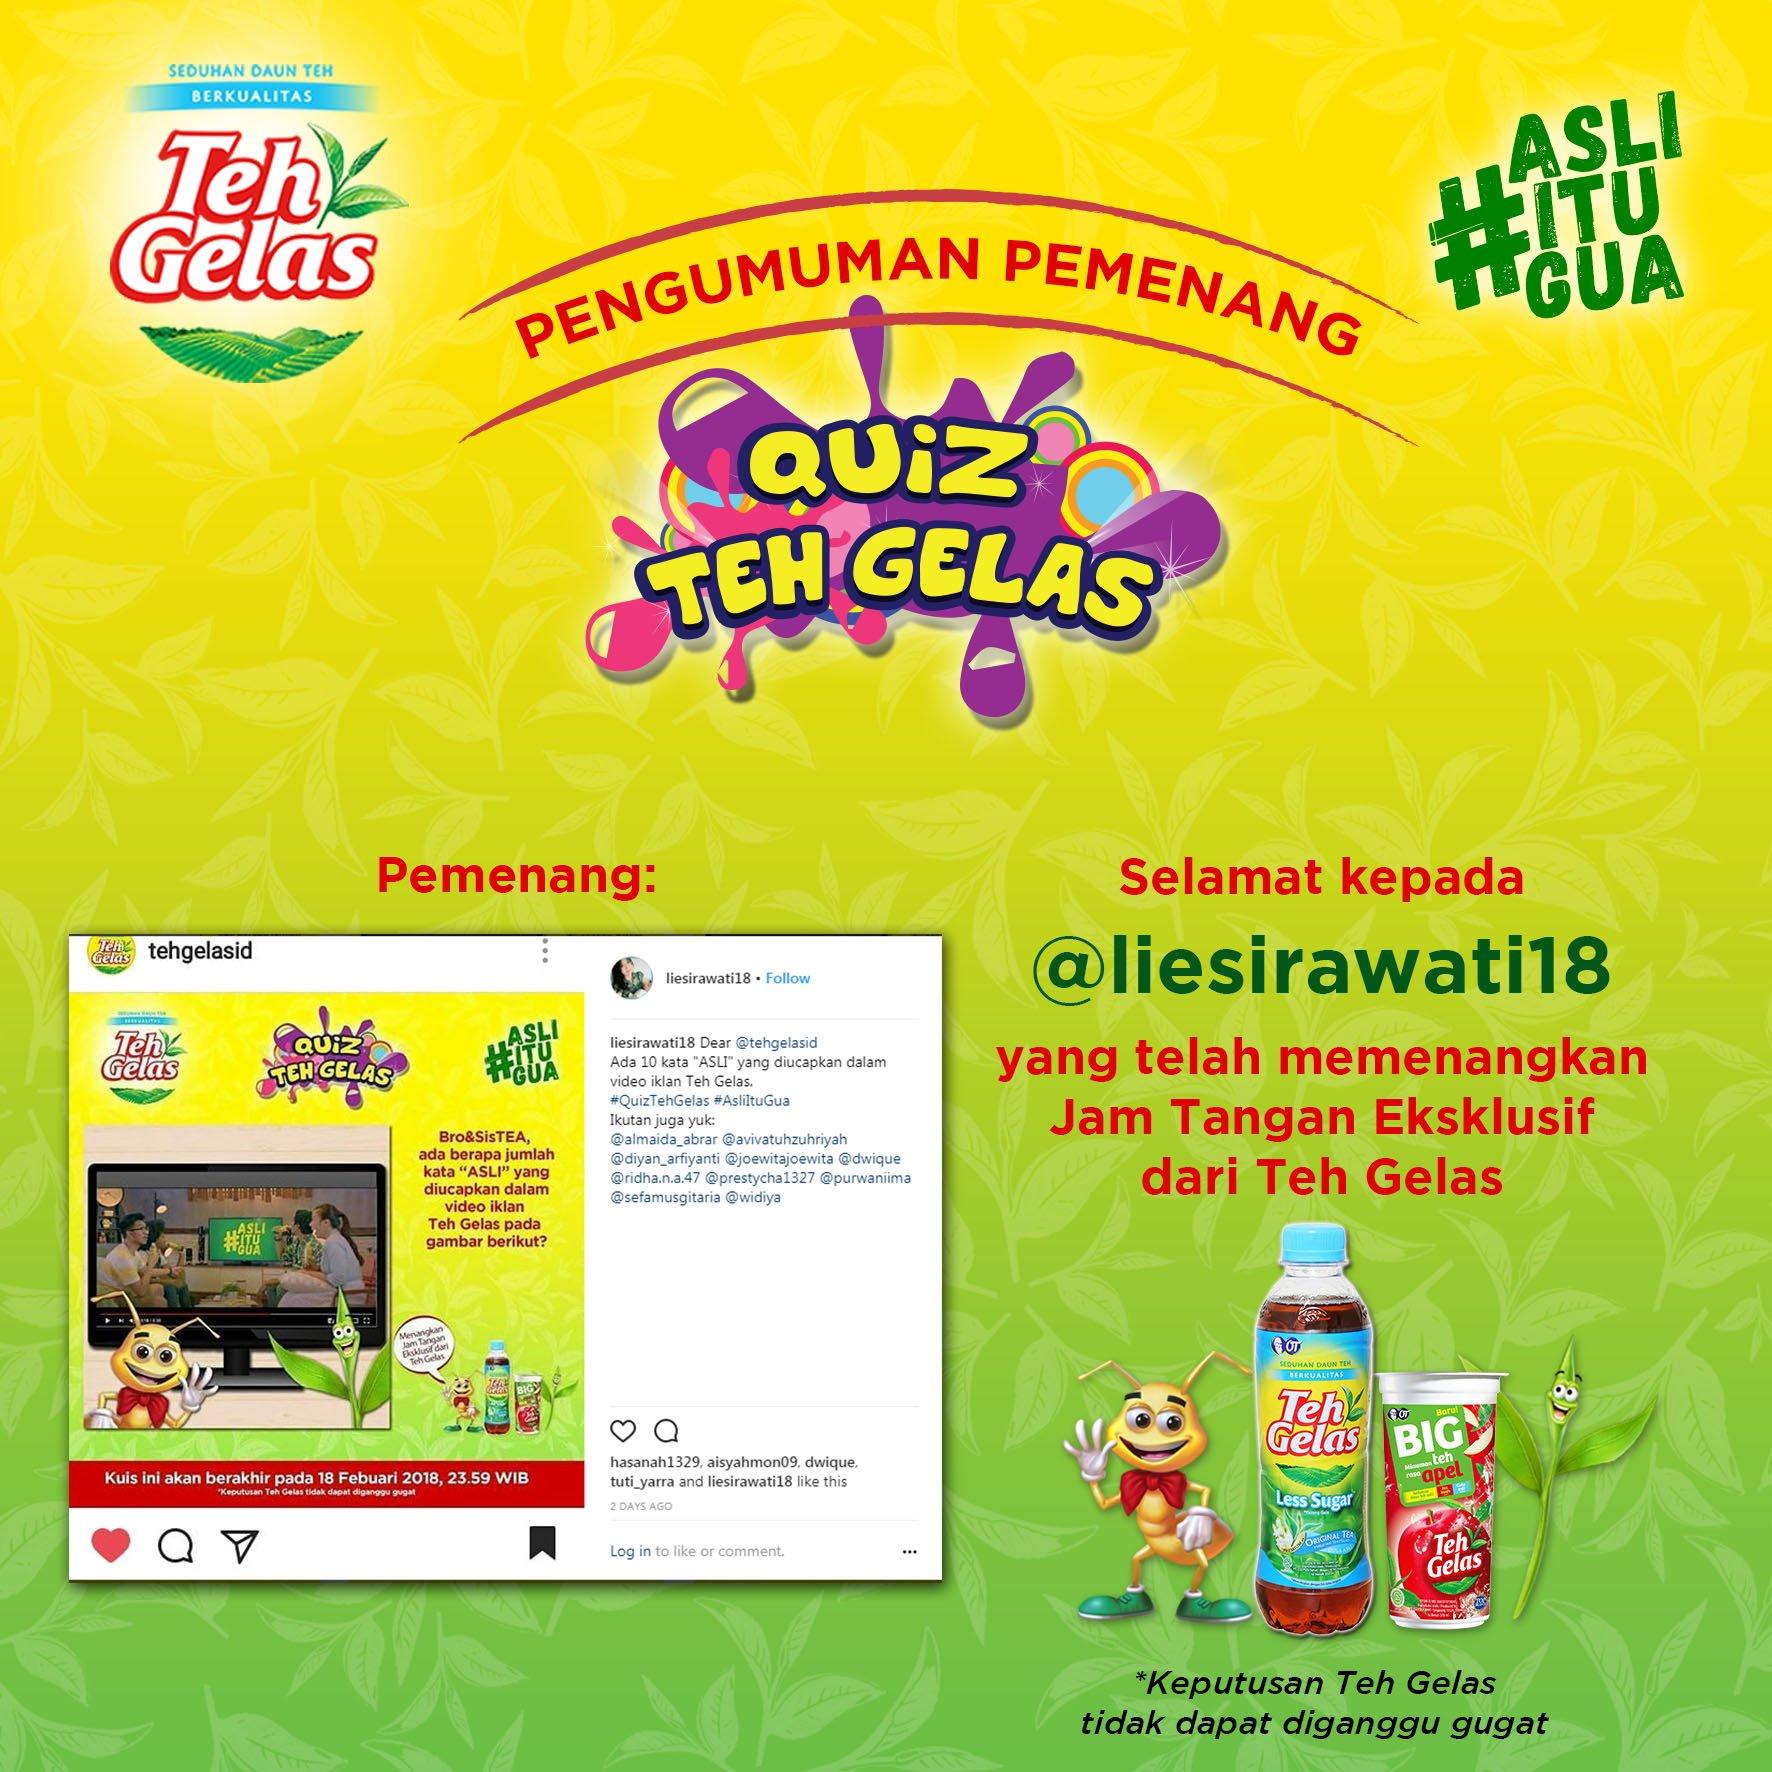 Teh Gelas On Twitter Selamat Liesirawati18 Ig Pemenang